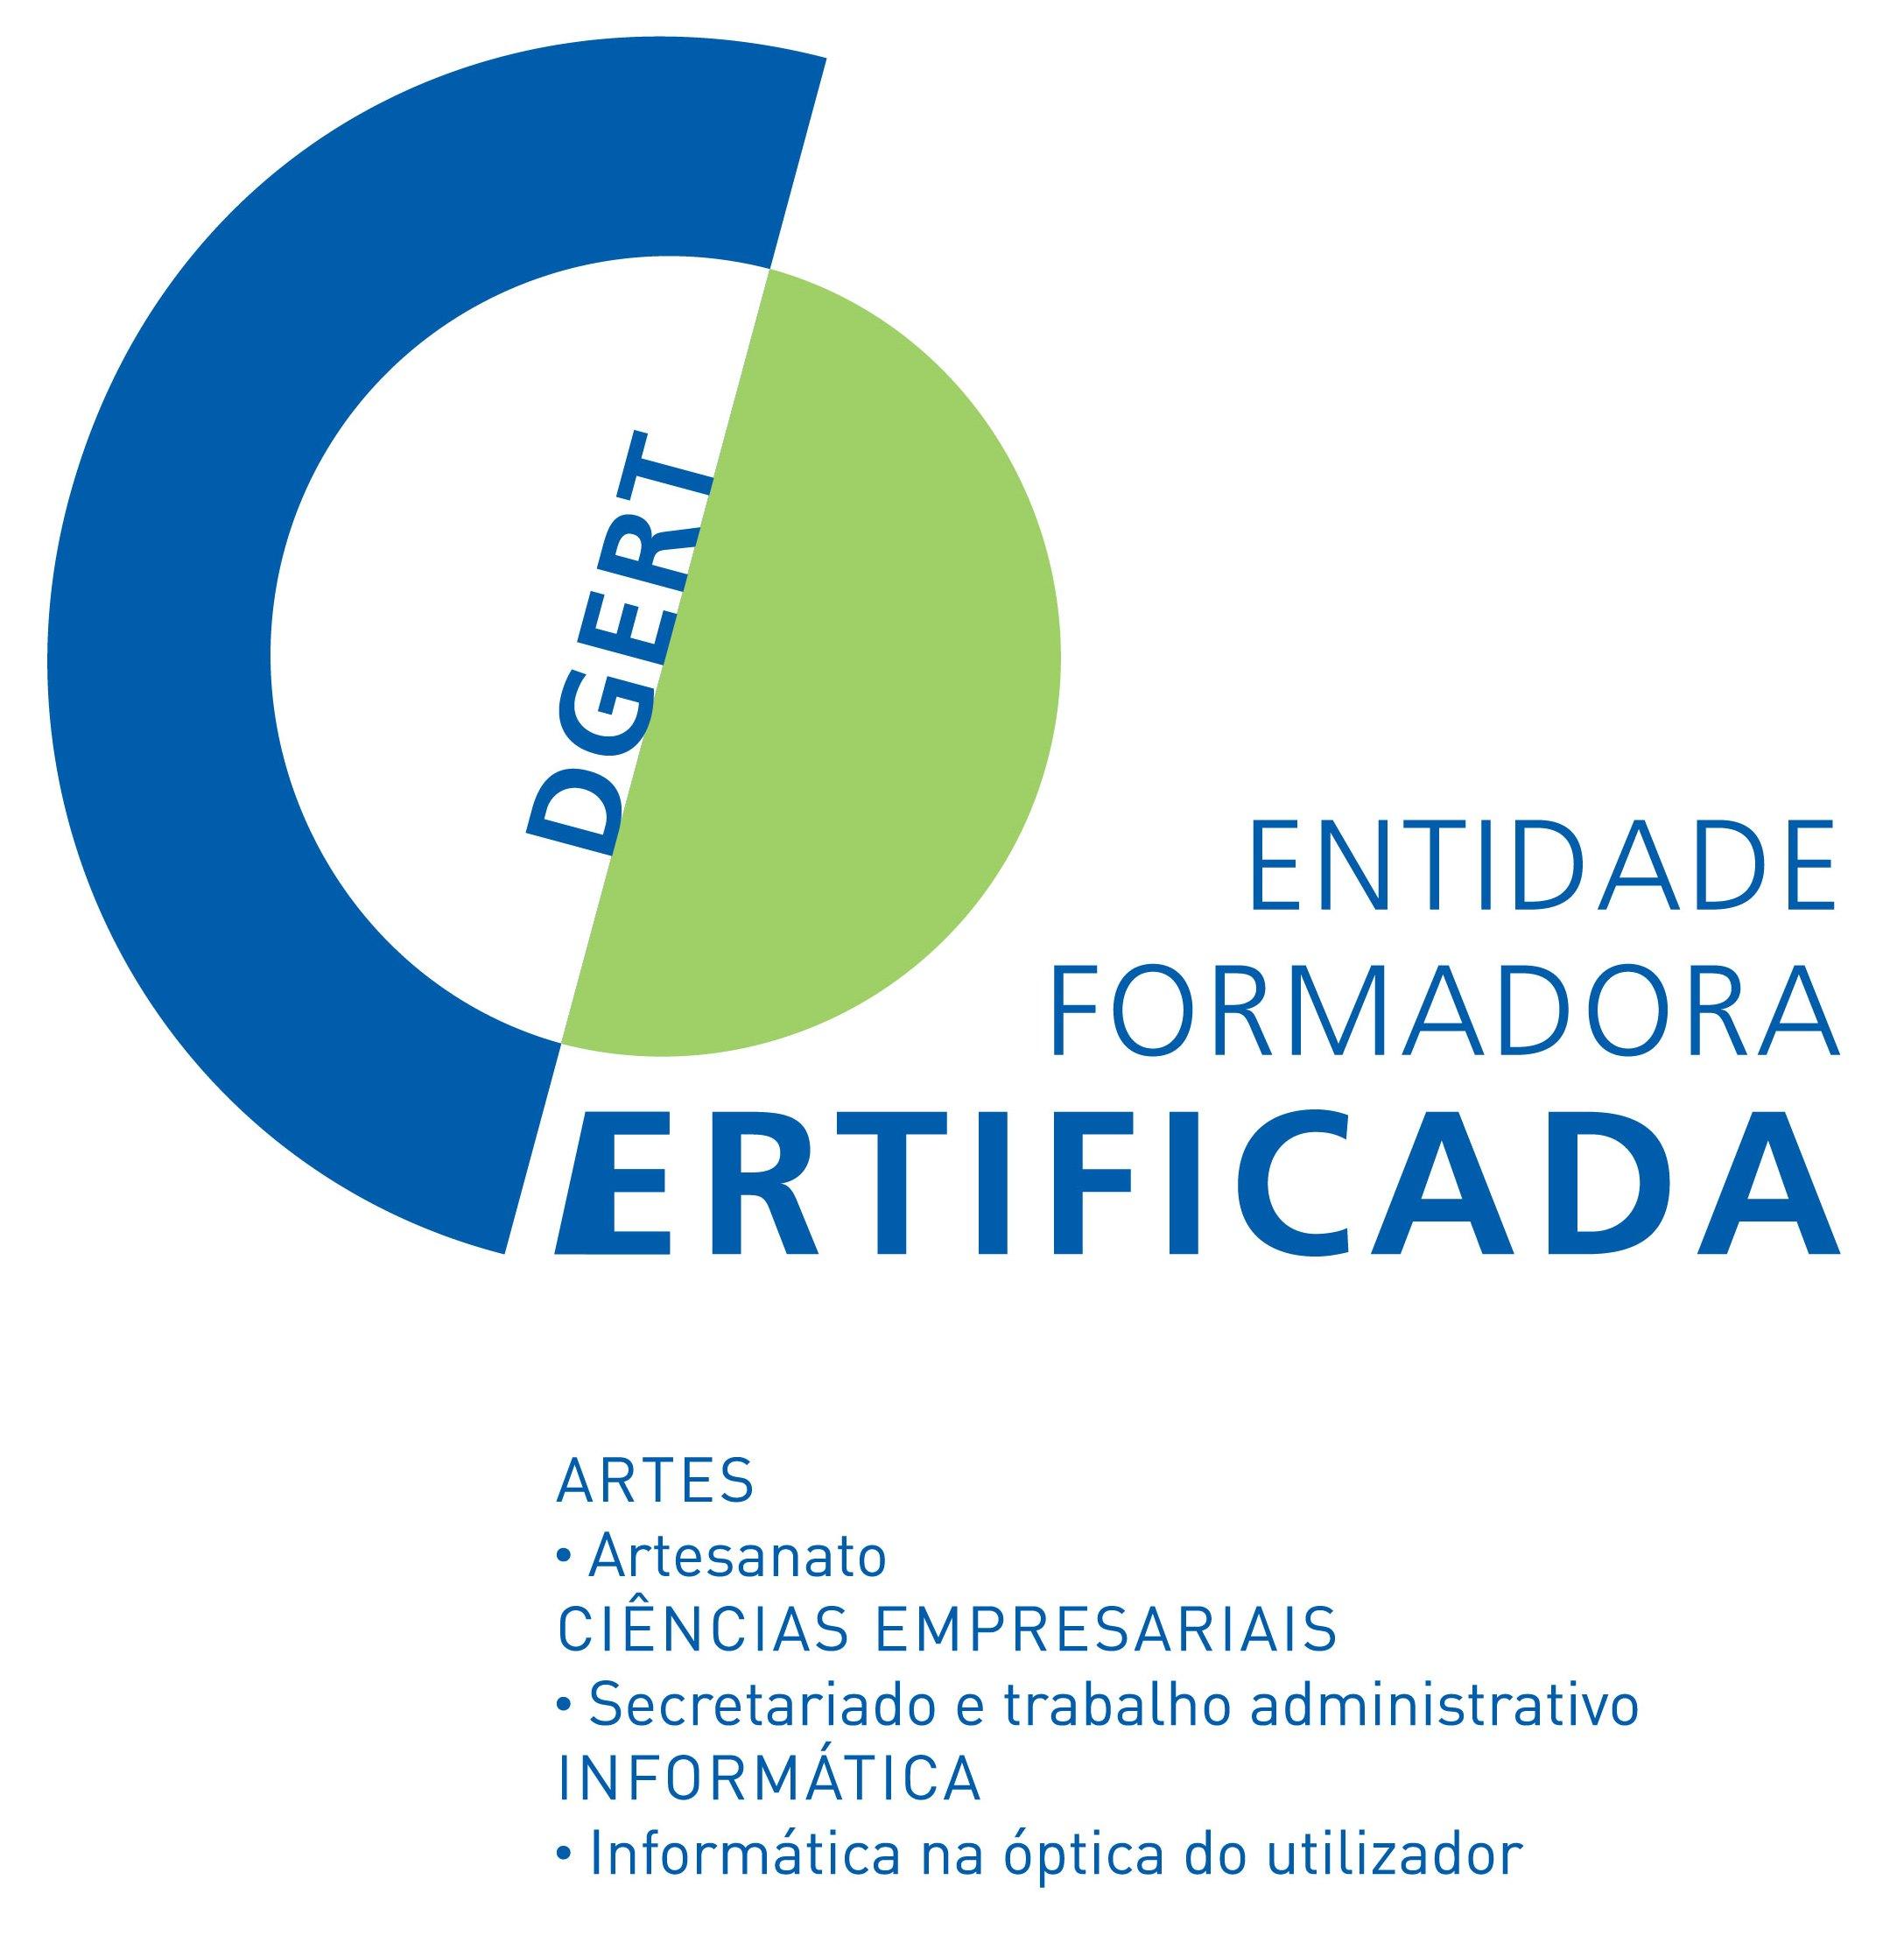 Logotipo de Entidade Certificada